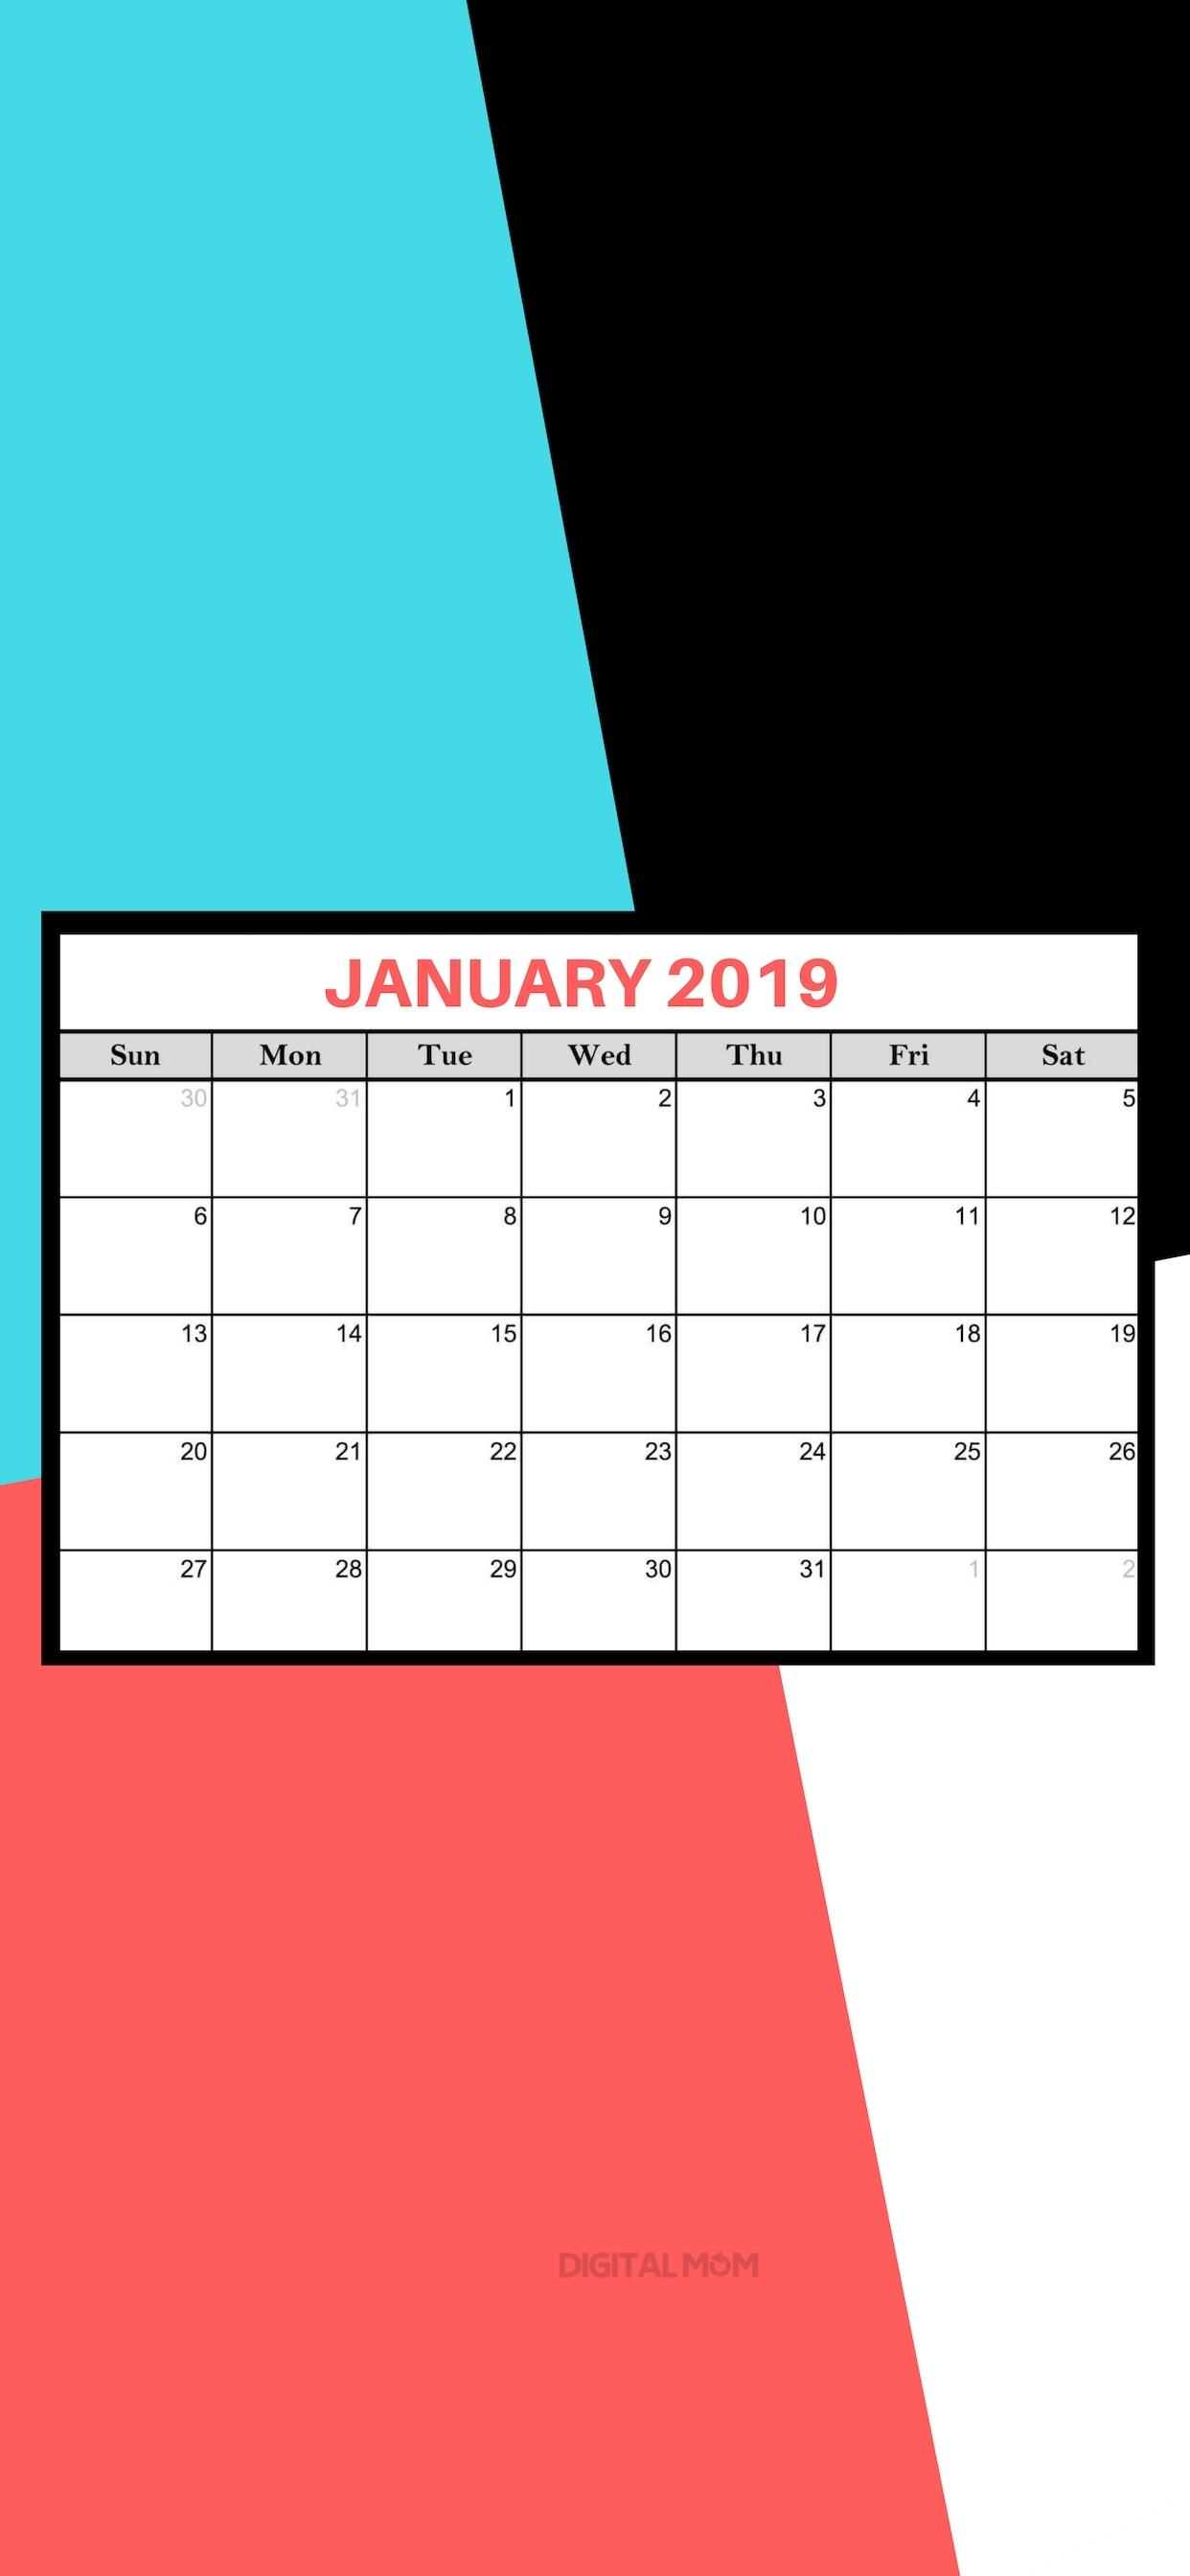 January 2019 Calendars For Print, Desktop Wallpaper & Iphone Background